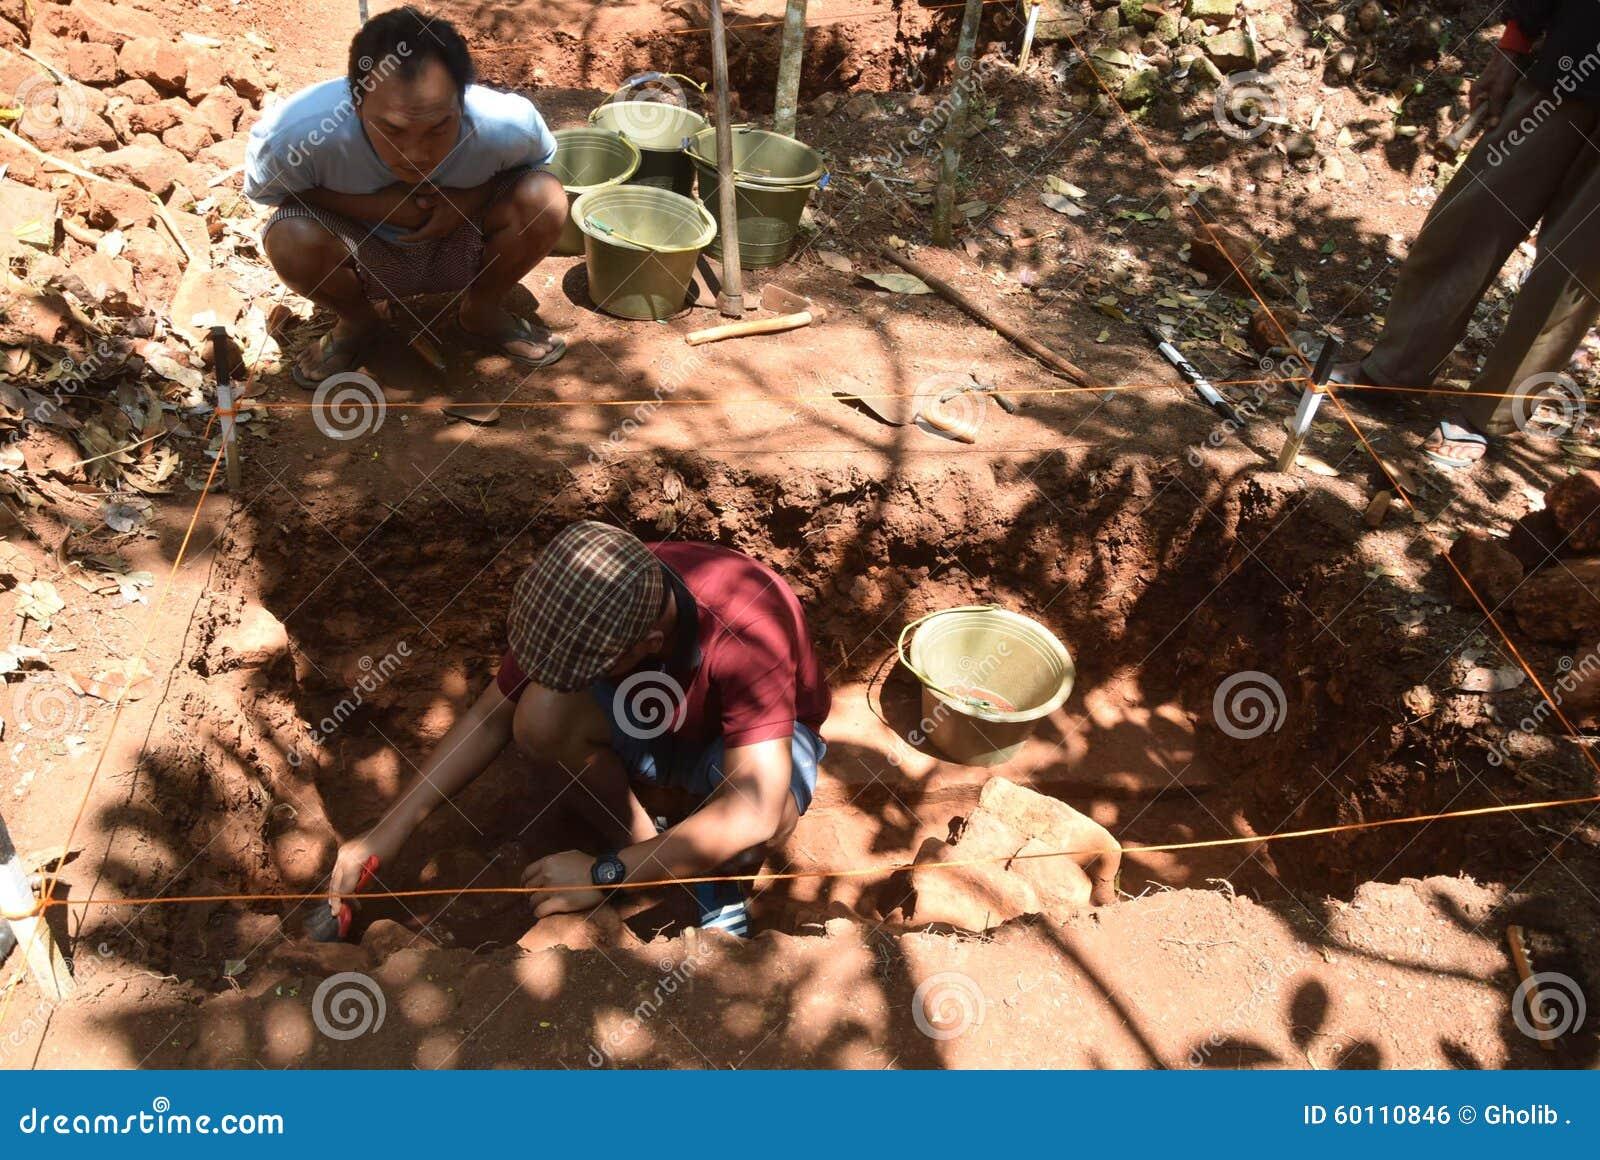 BUILDING Excavation TEMPLE Editorial Photo - Image: 60110846